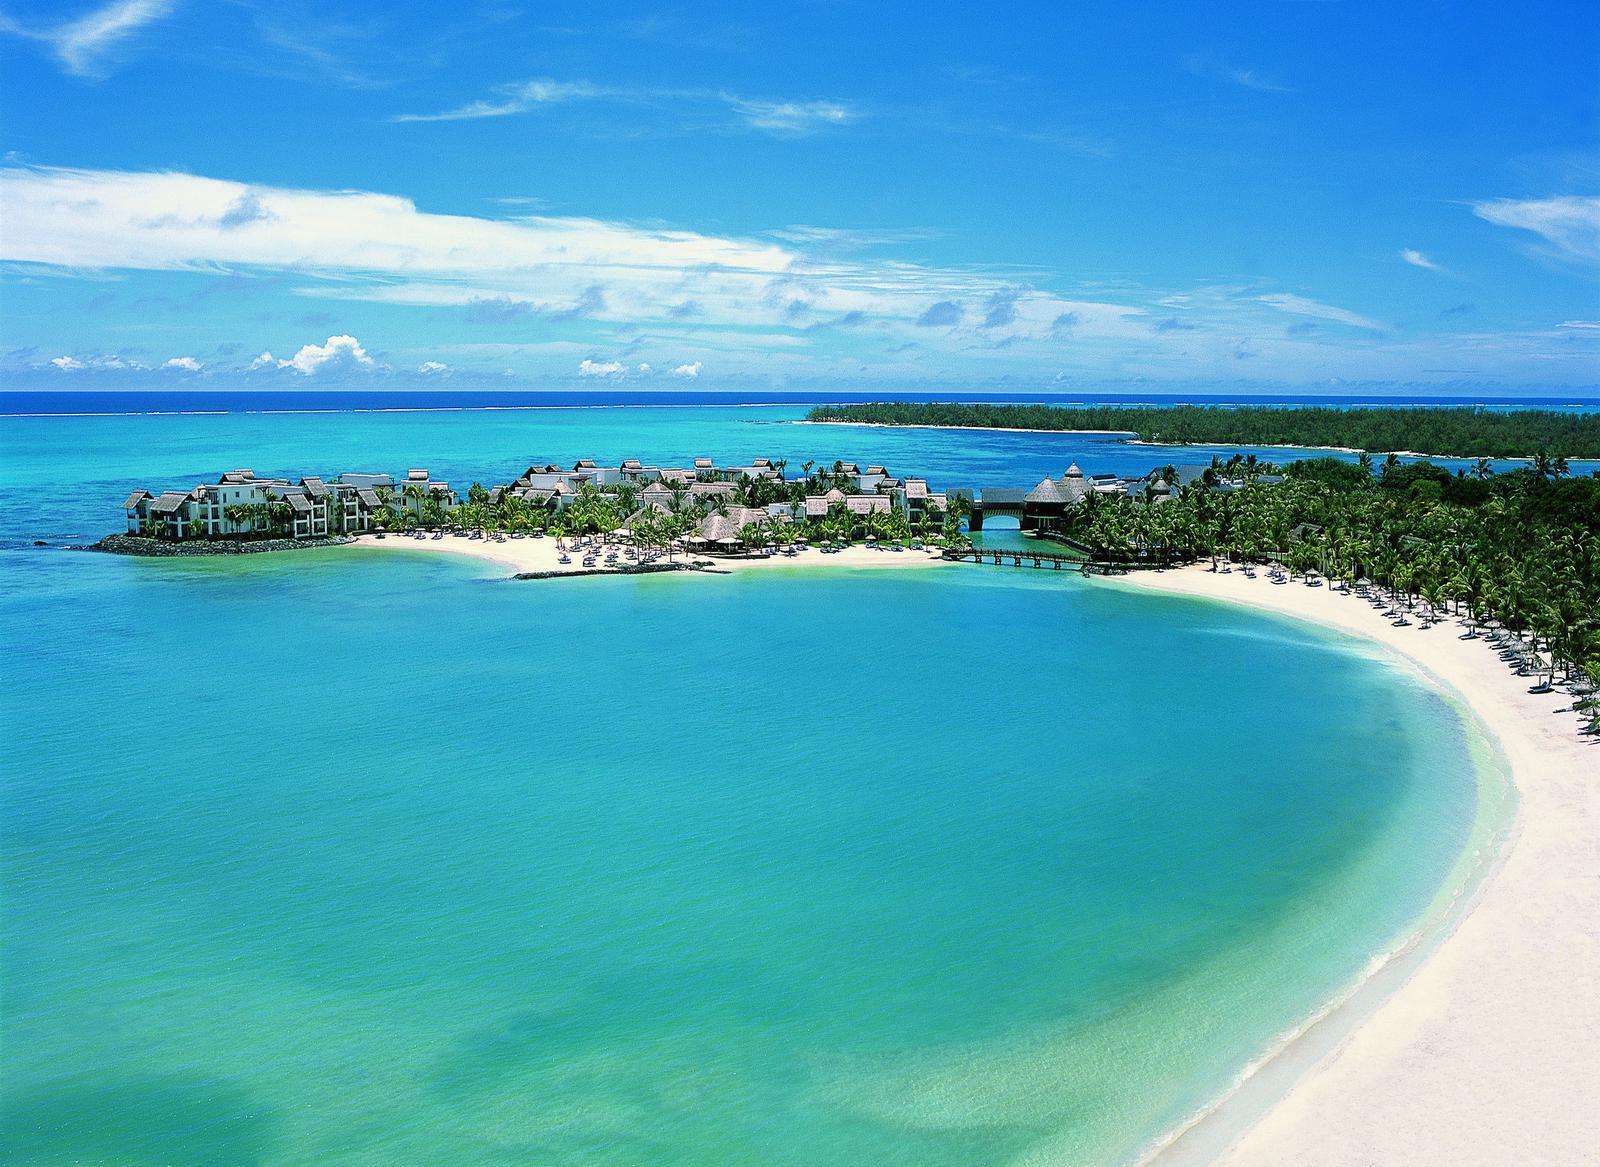 Resort de playa Le Touessrok en Islas Maldivas